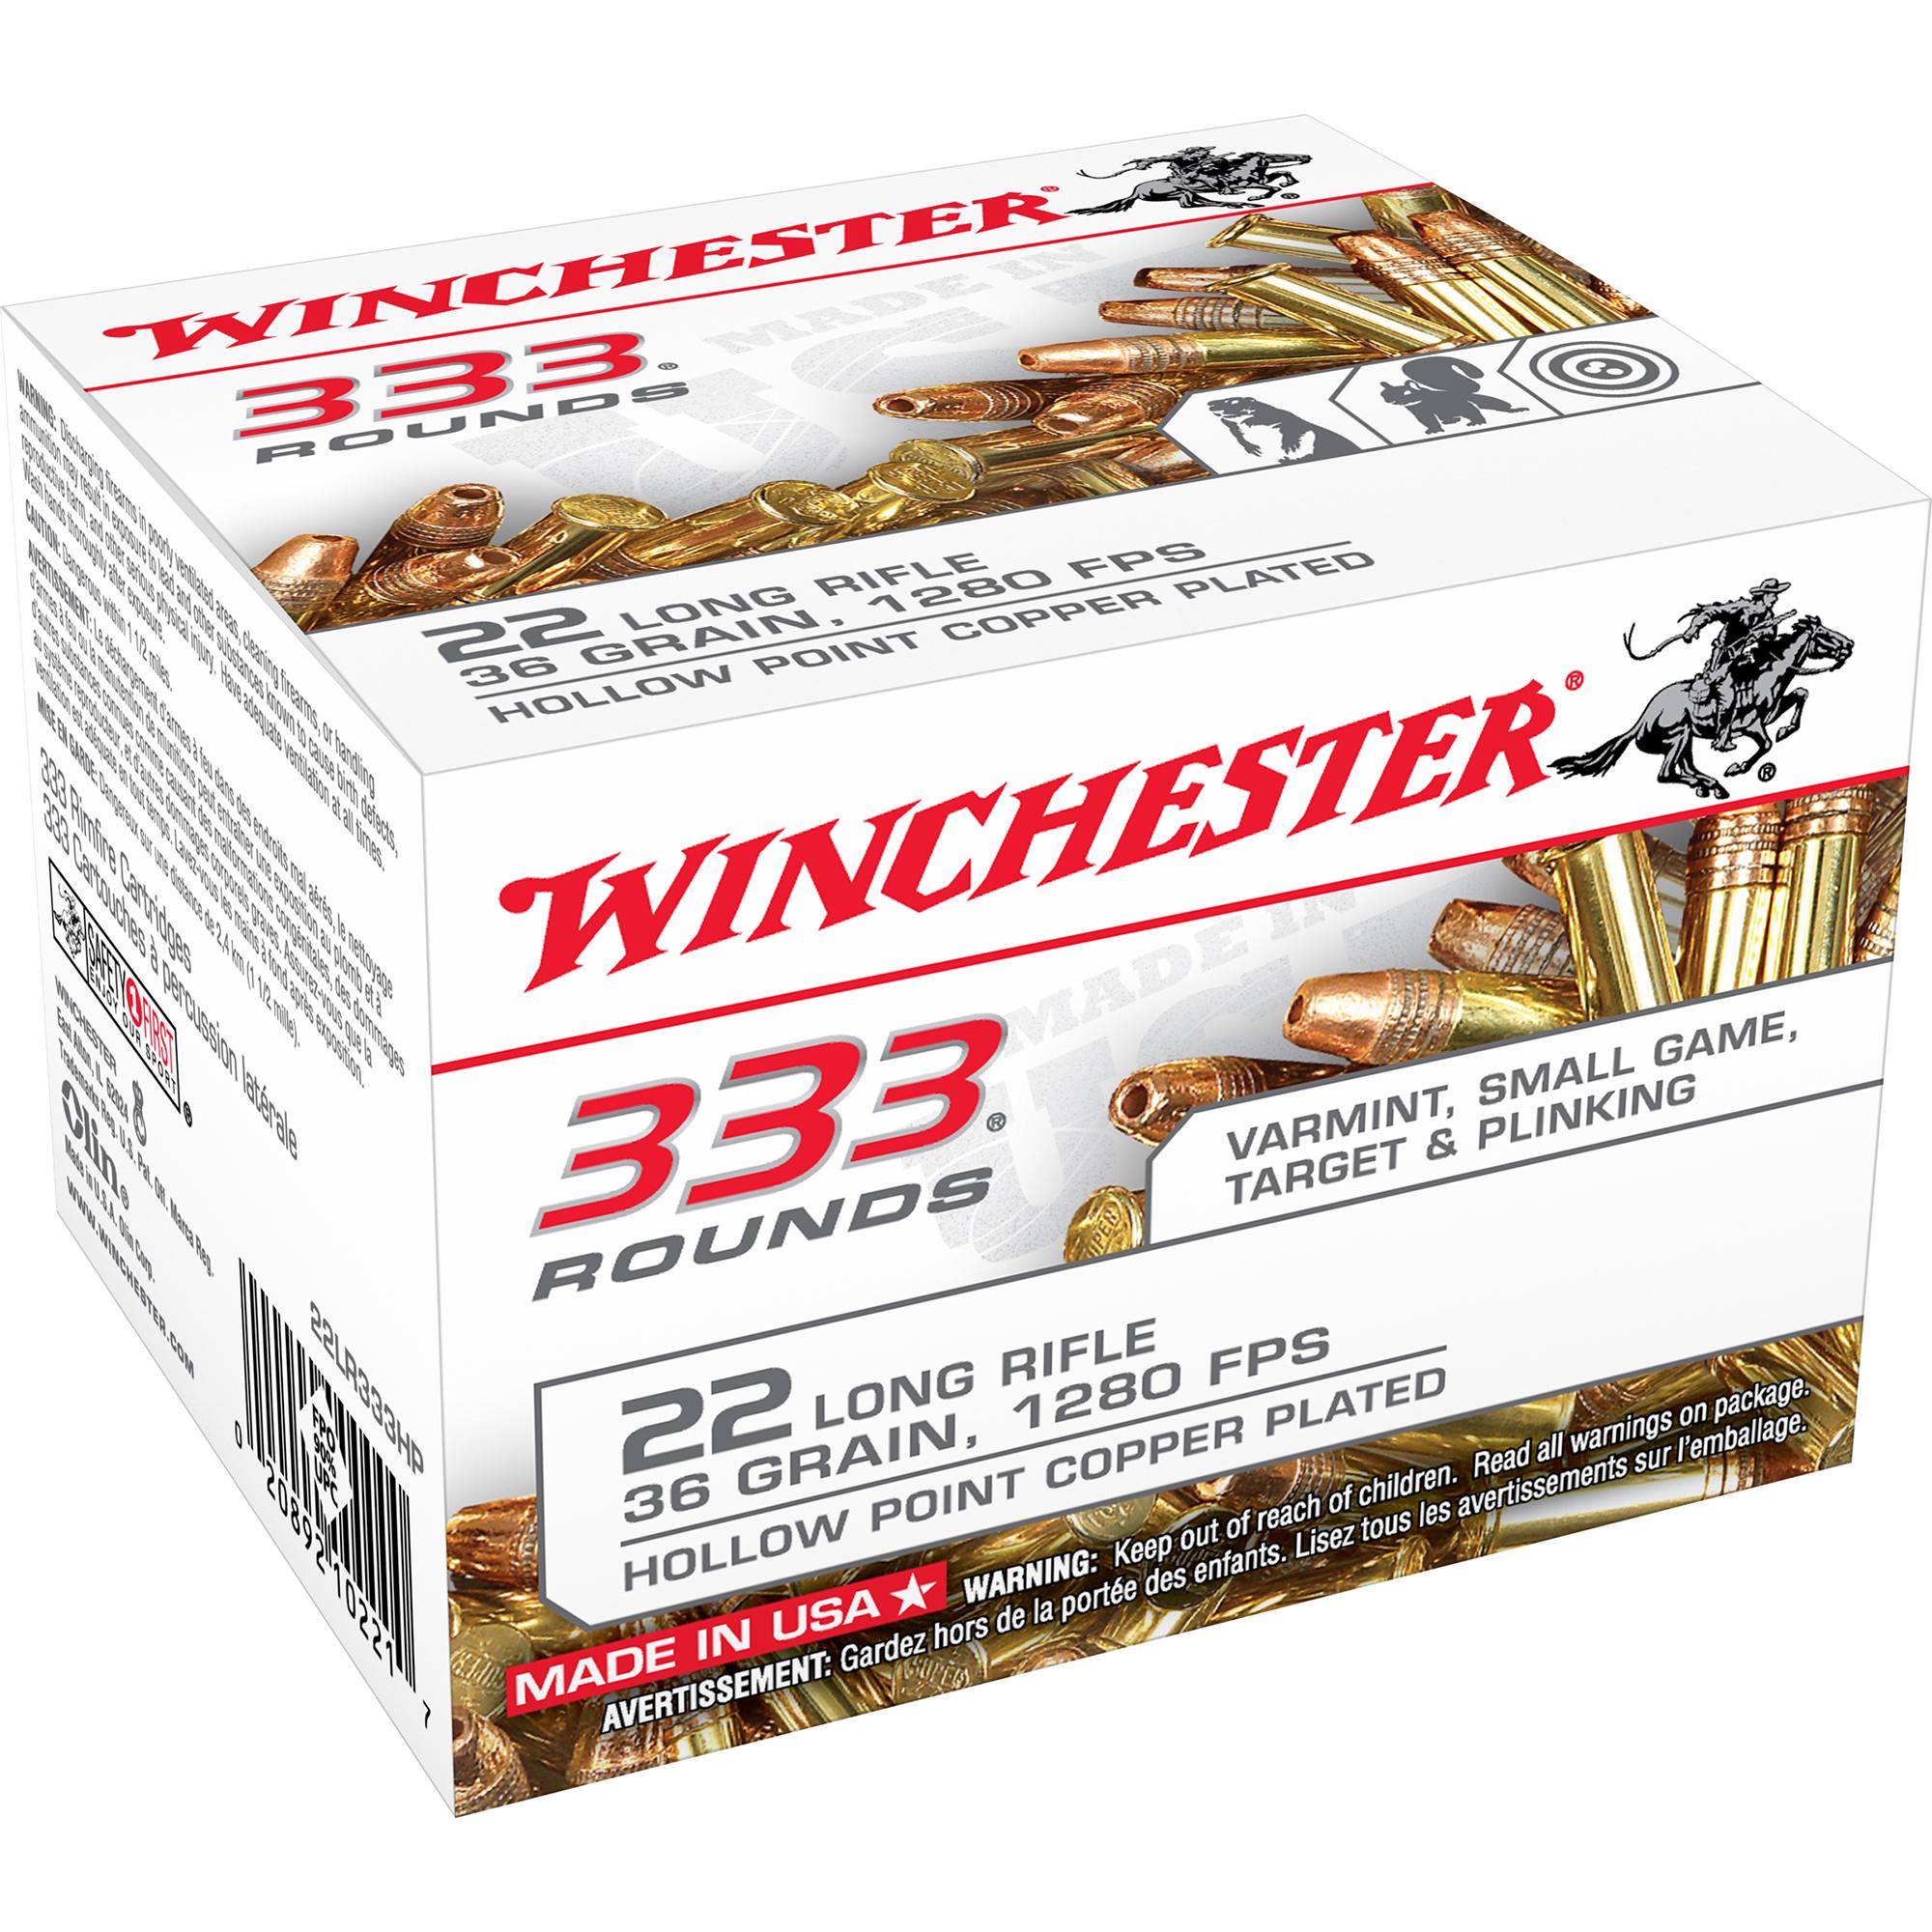 Winchester .22 LR 333 Ammunition Bulk Pack, 36-gr, CPHP